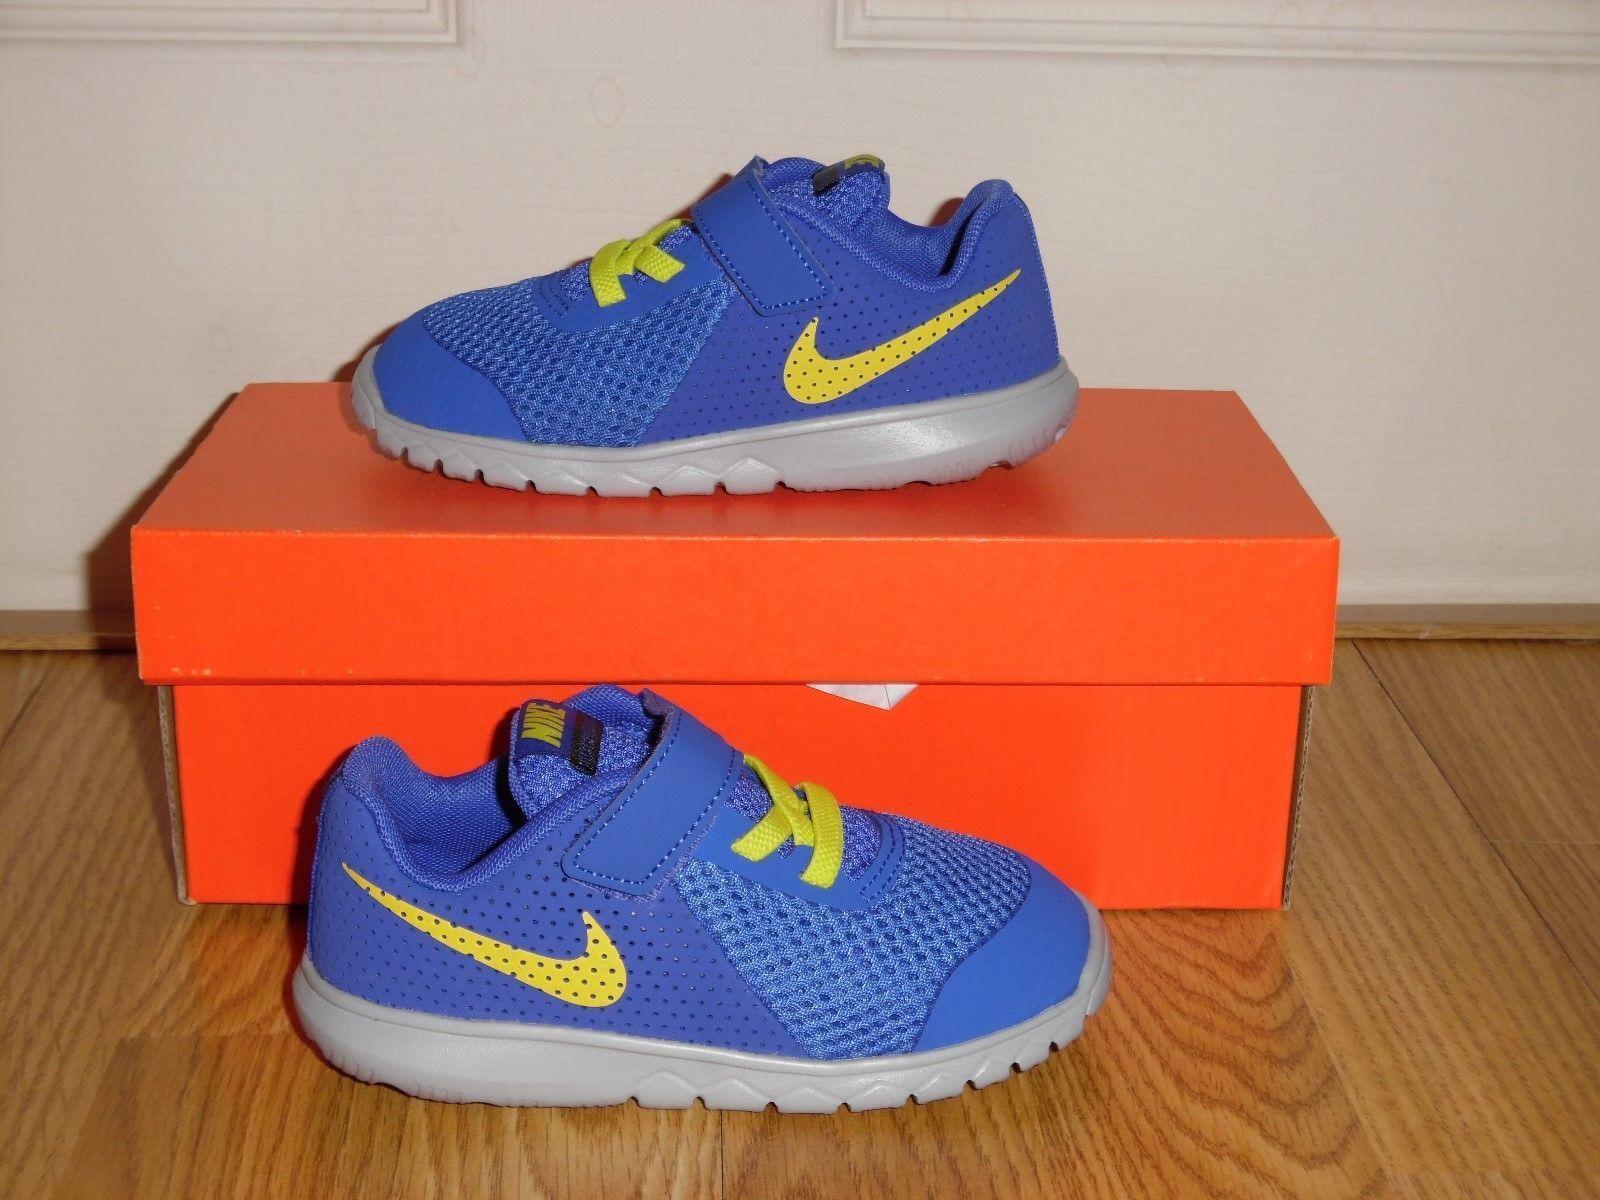 NEW Nike Flex Experience 5 (TDV) shoes